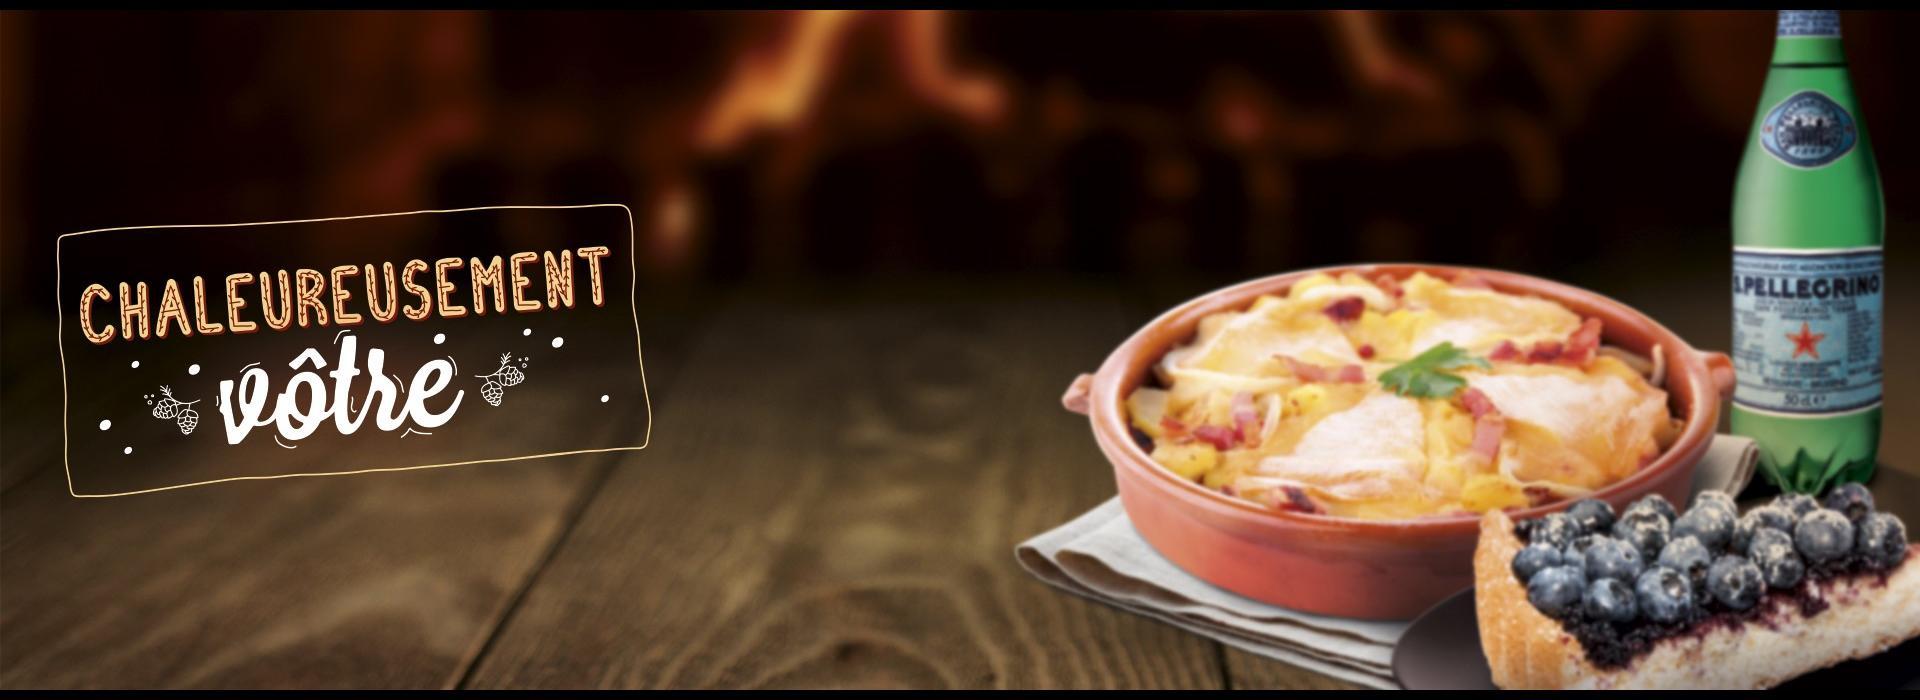 Autogrill Chaleureusement Menu Autoroute Tartiflette Hiver Gourmande Lardons Myrtilles Restaurant